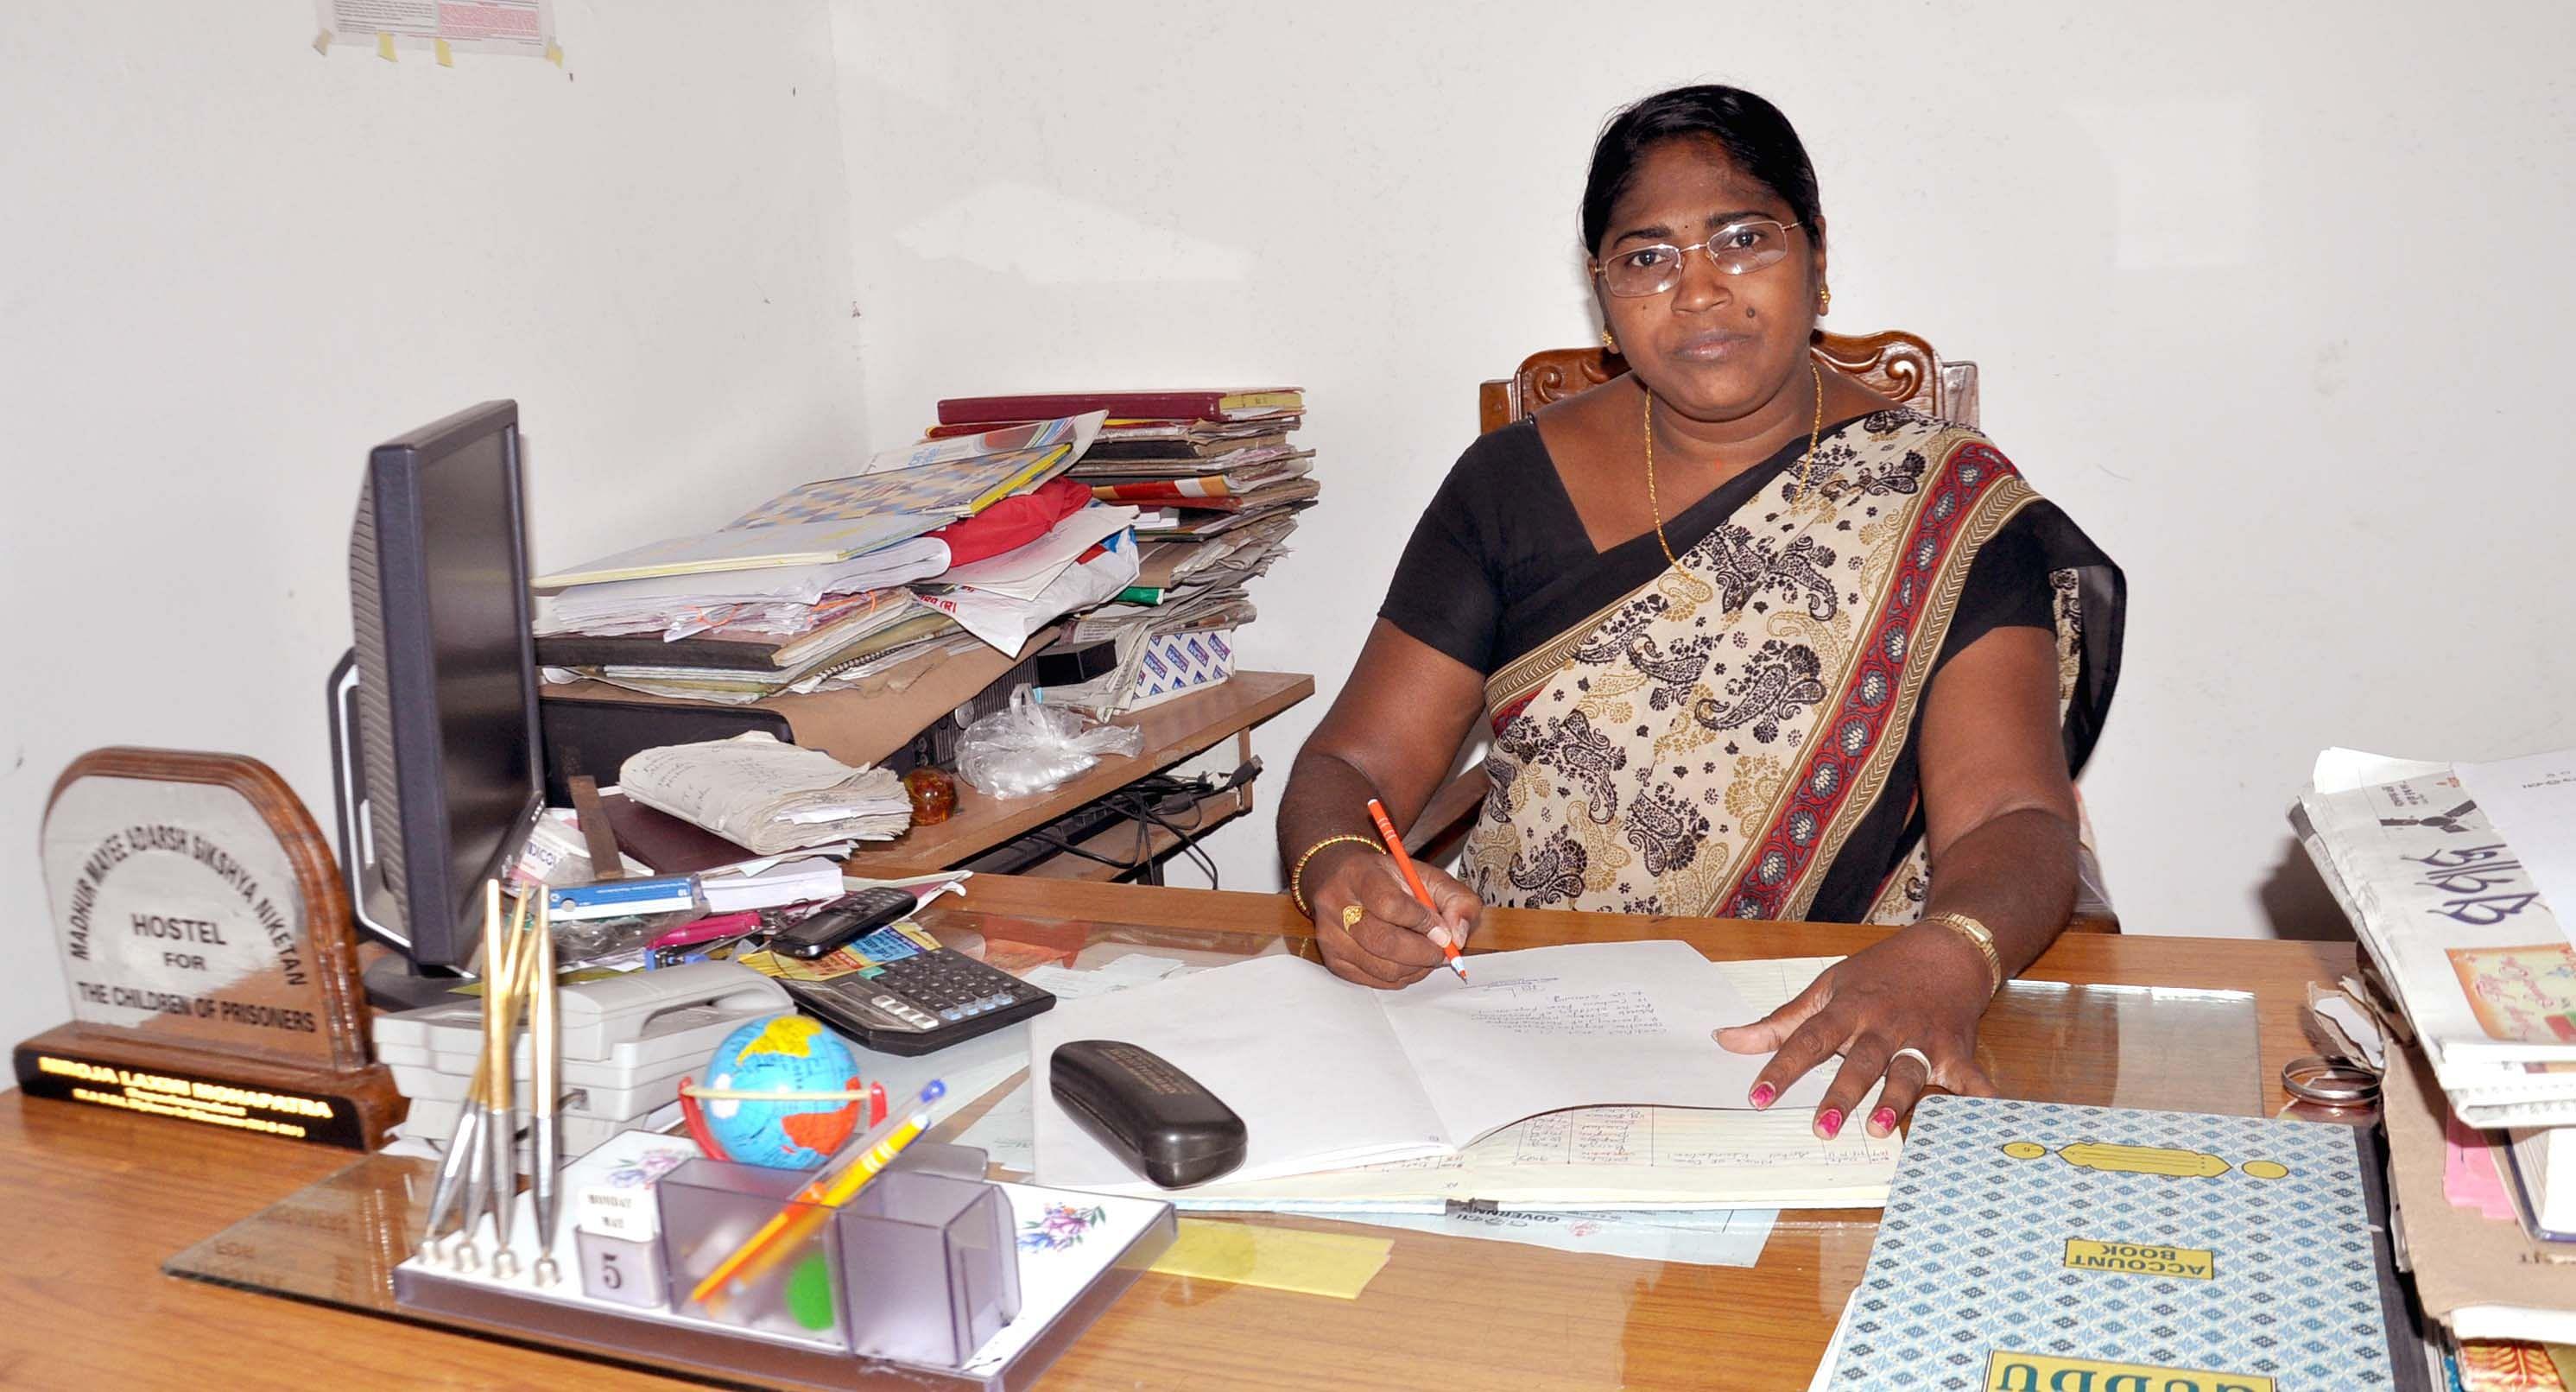 Social activist, Nirajalaxmi Mohapatra runs a home for children of convicts in Bhubaneswar. (Credit: Piyush Mohanty\WFS)